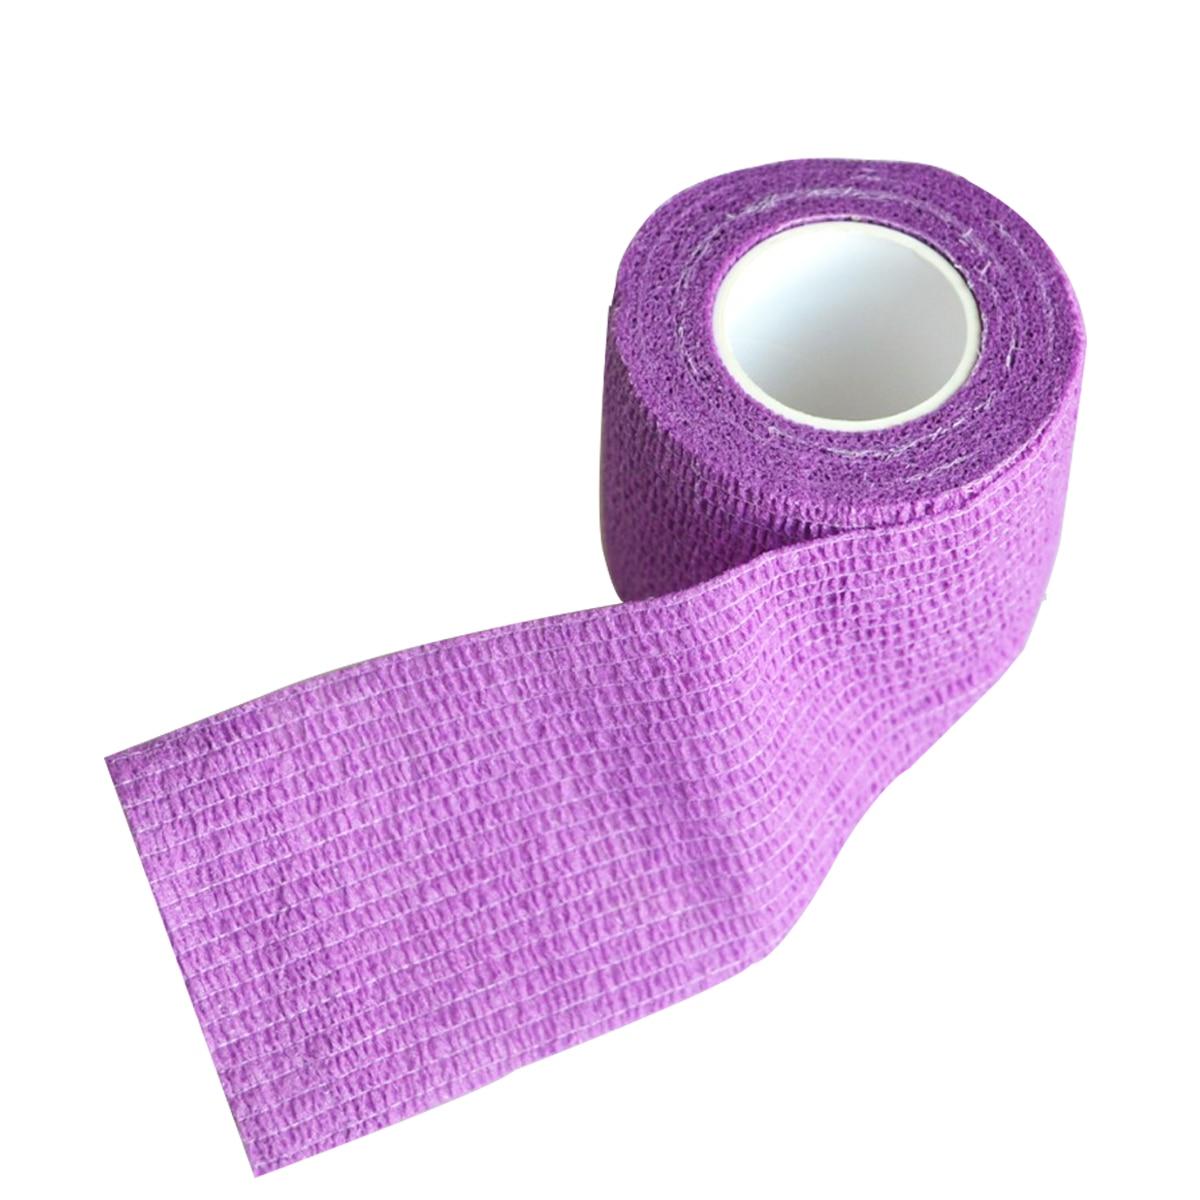 Wholesale 96Pcs/Lot Non woven Stretch Gauze Self Adhesive Cohesive Medical Bandage 5cm*4.5m Purple цена